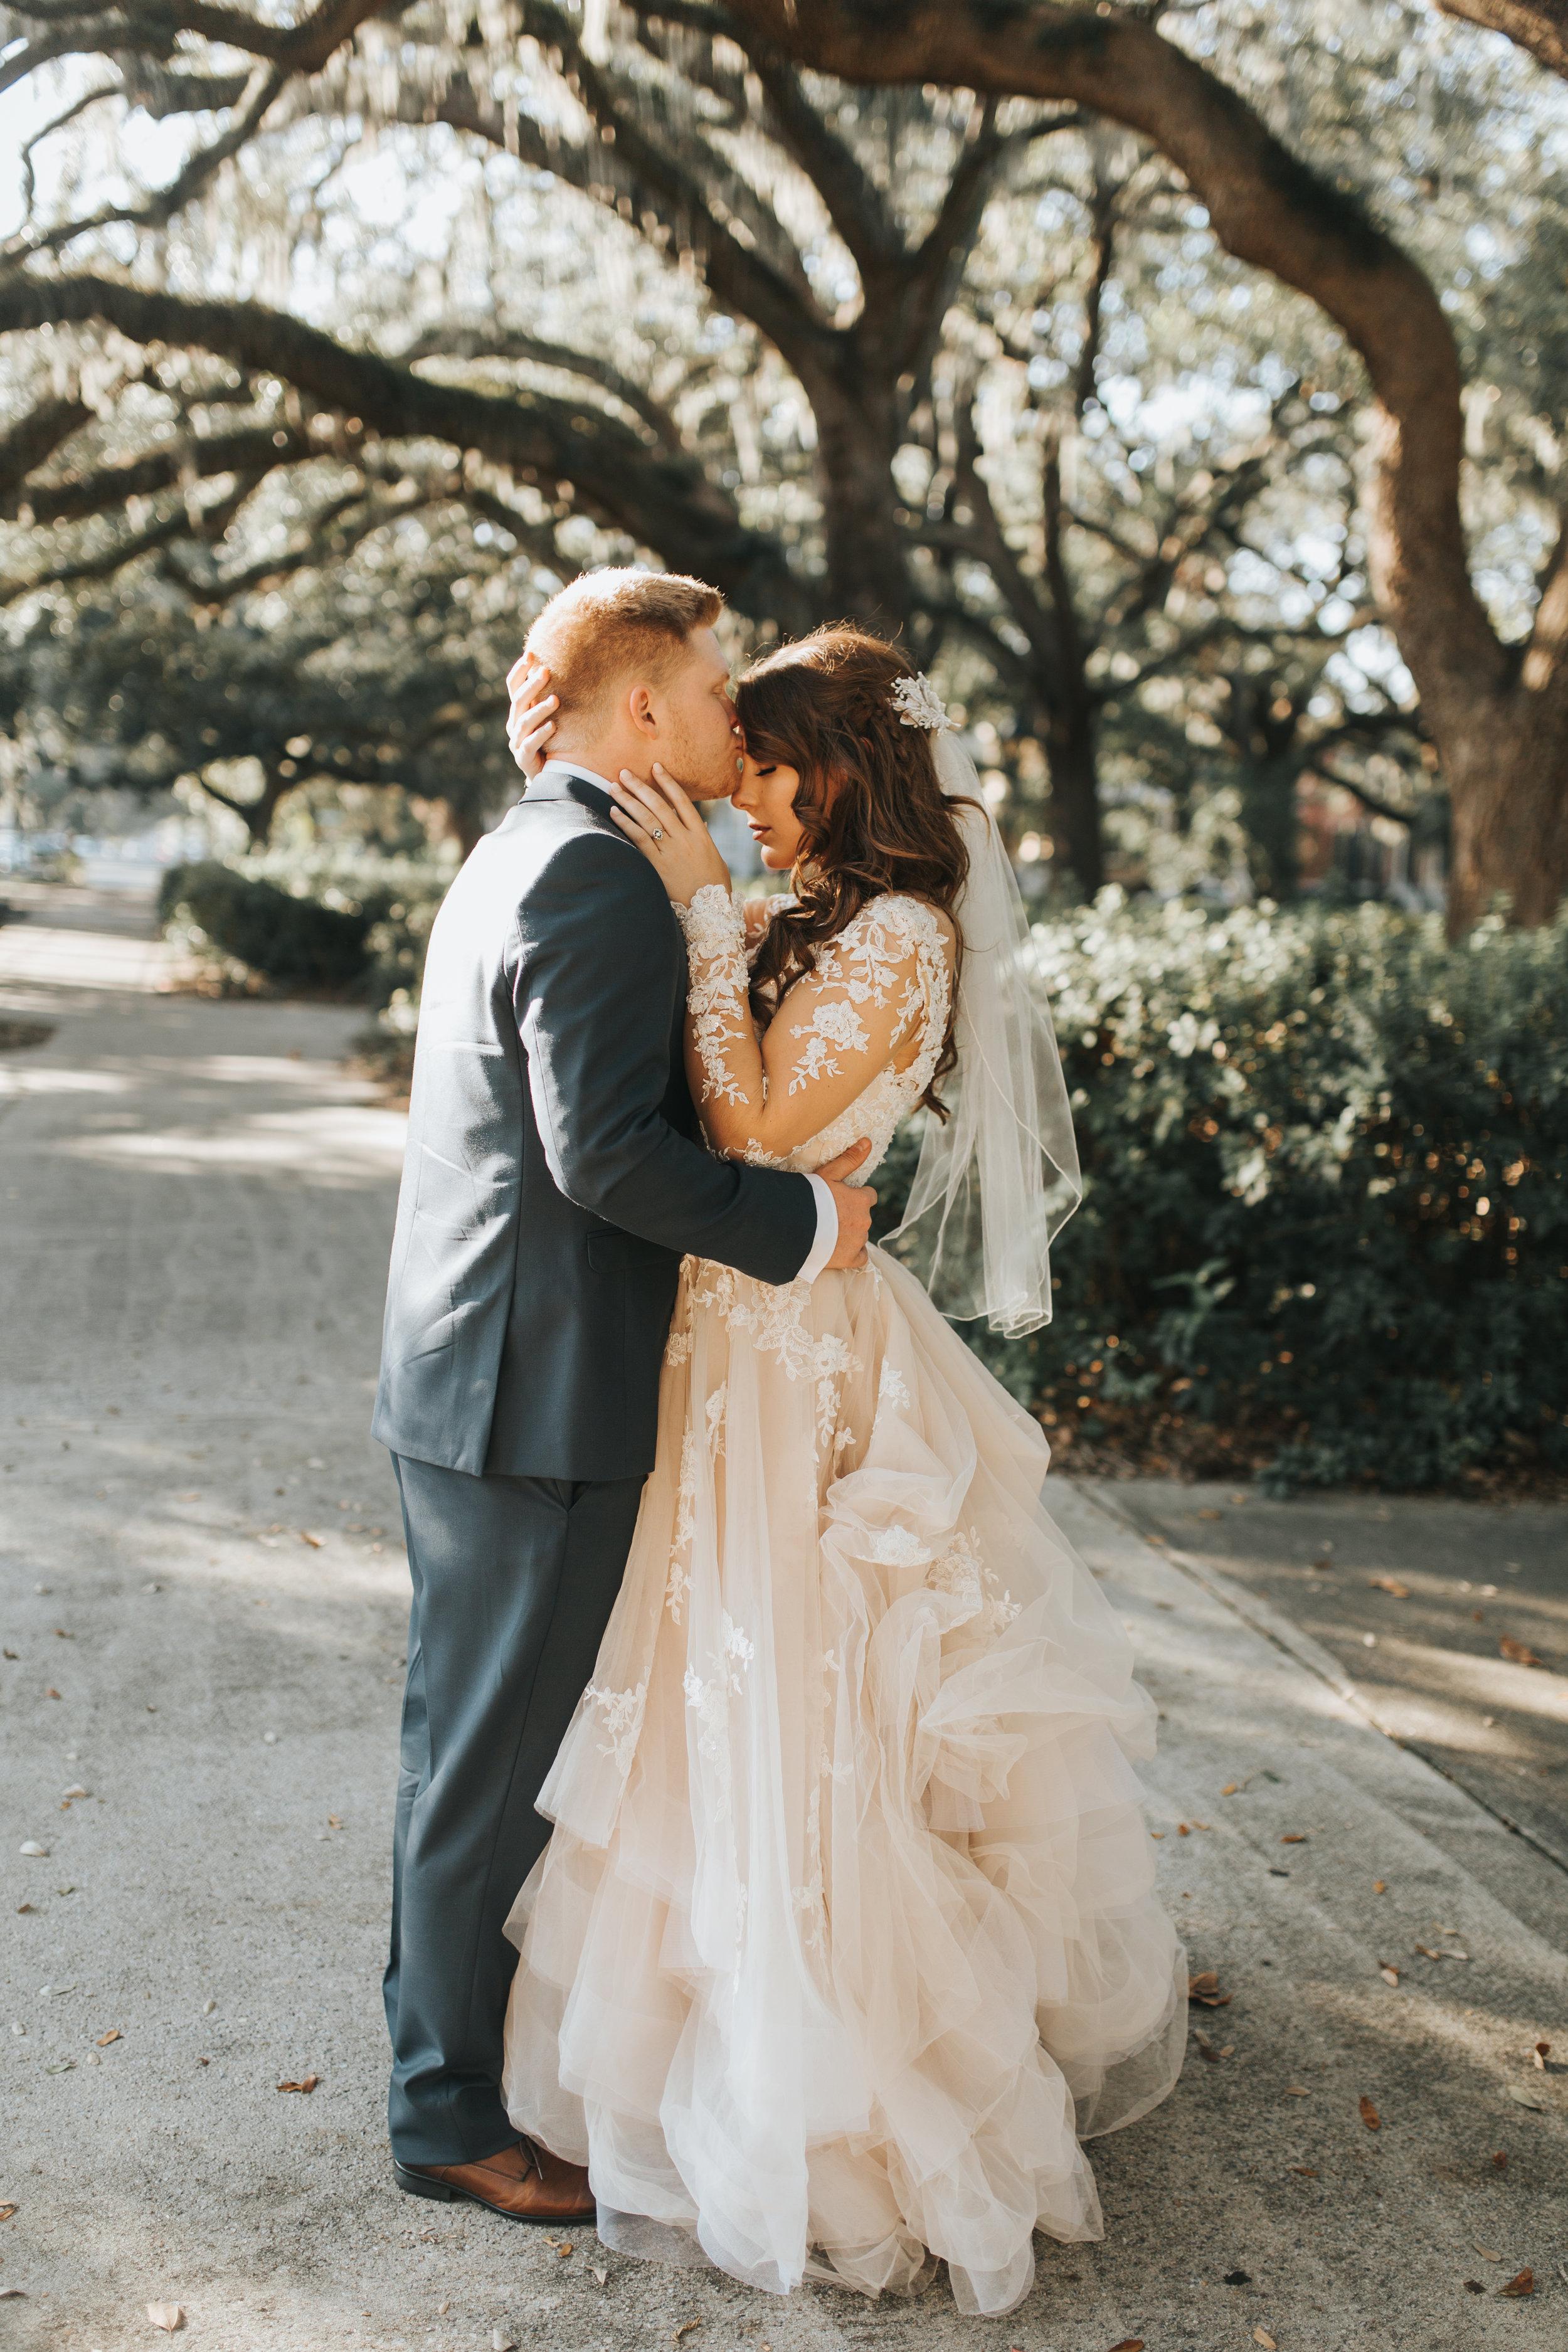 Richmond wedding photographer, Virginia wedding photographer, Destination wedding photographer, Savannah Georgia wedding photographer, Charlottesville wedding photographer, 488.JPG